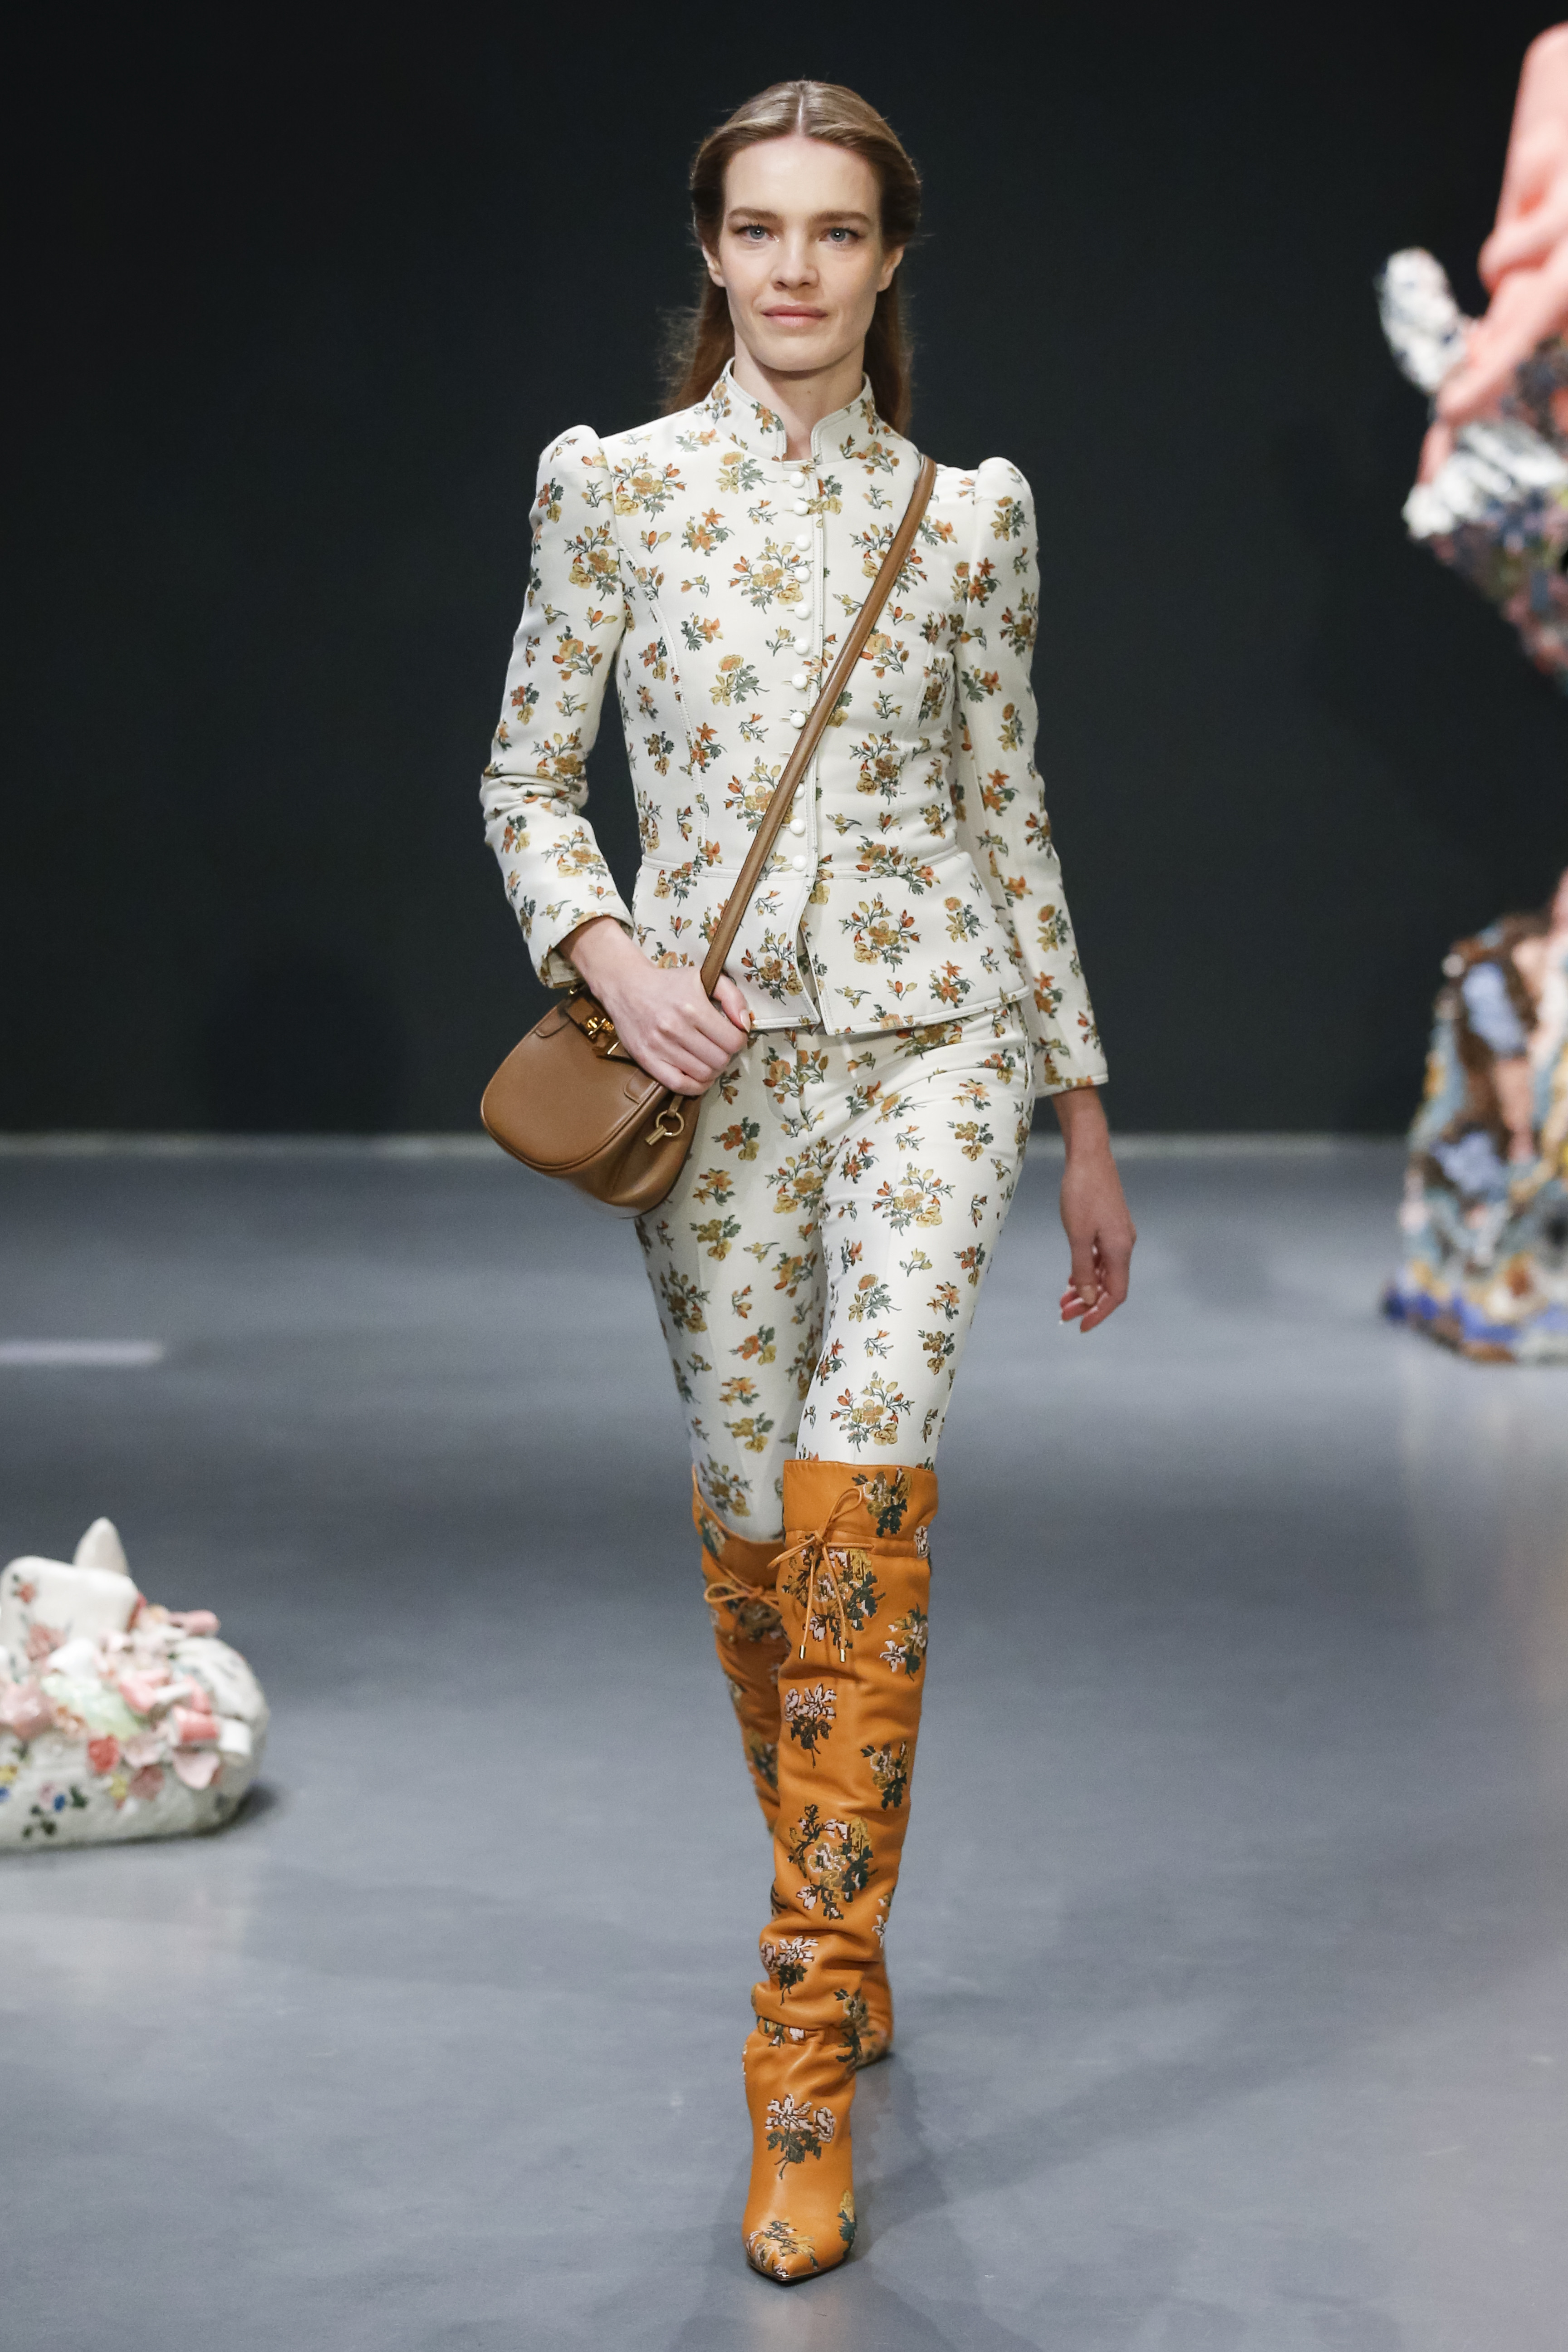 Tory burch、Jason Wu 纽约时装周 。